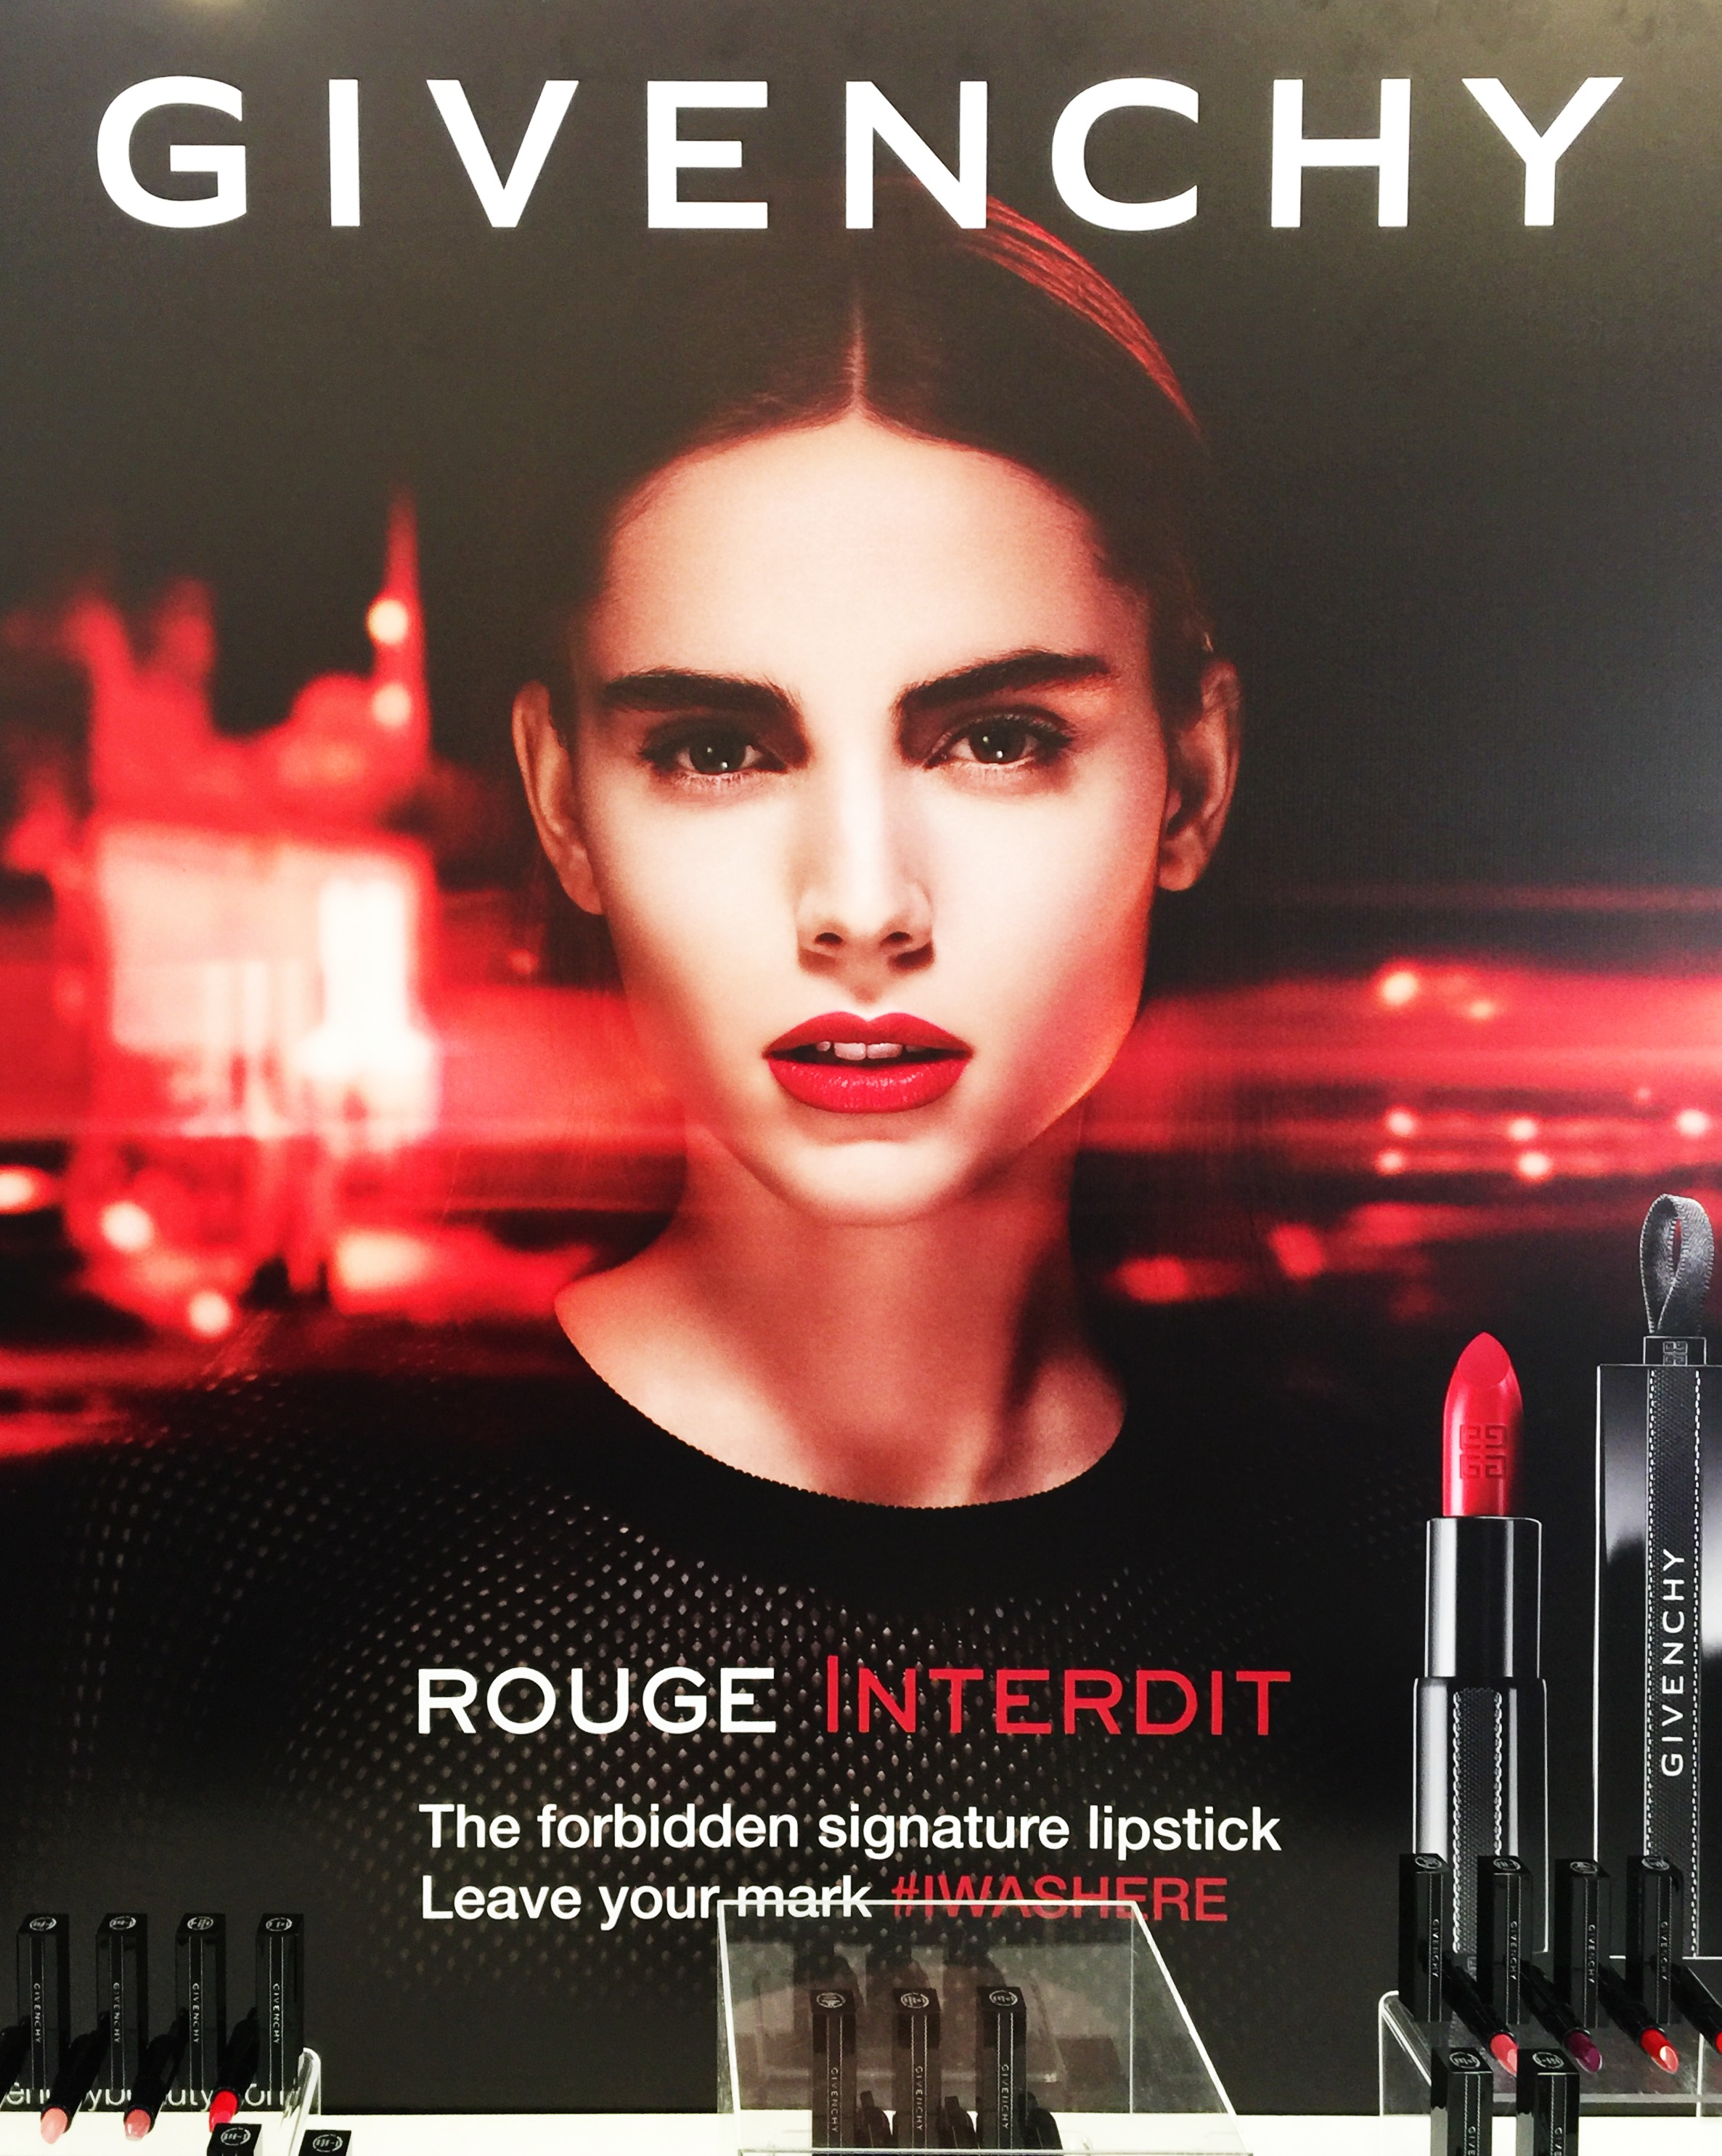 Marisa Robinson Beauty Blogger Sephora Exclusive Brands Showcase 2017 Givenchy